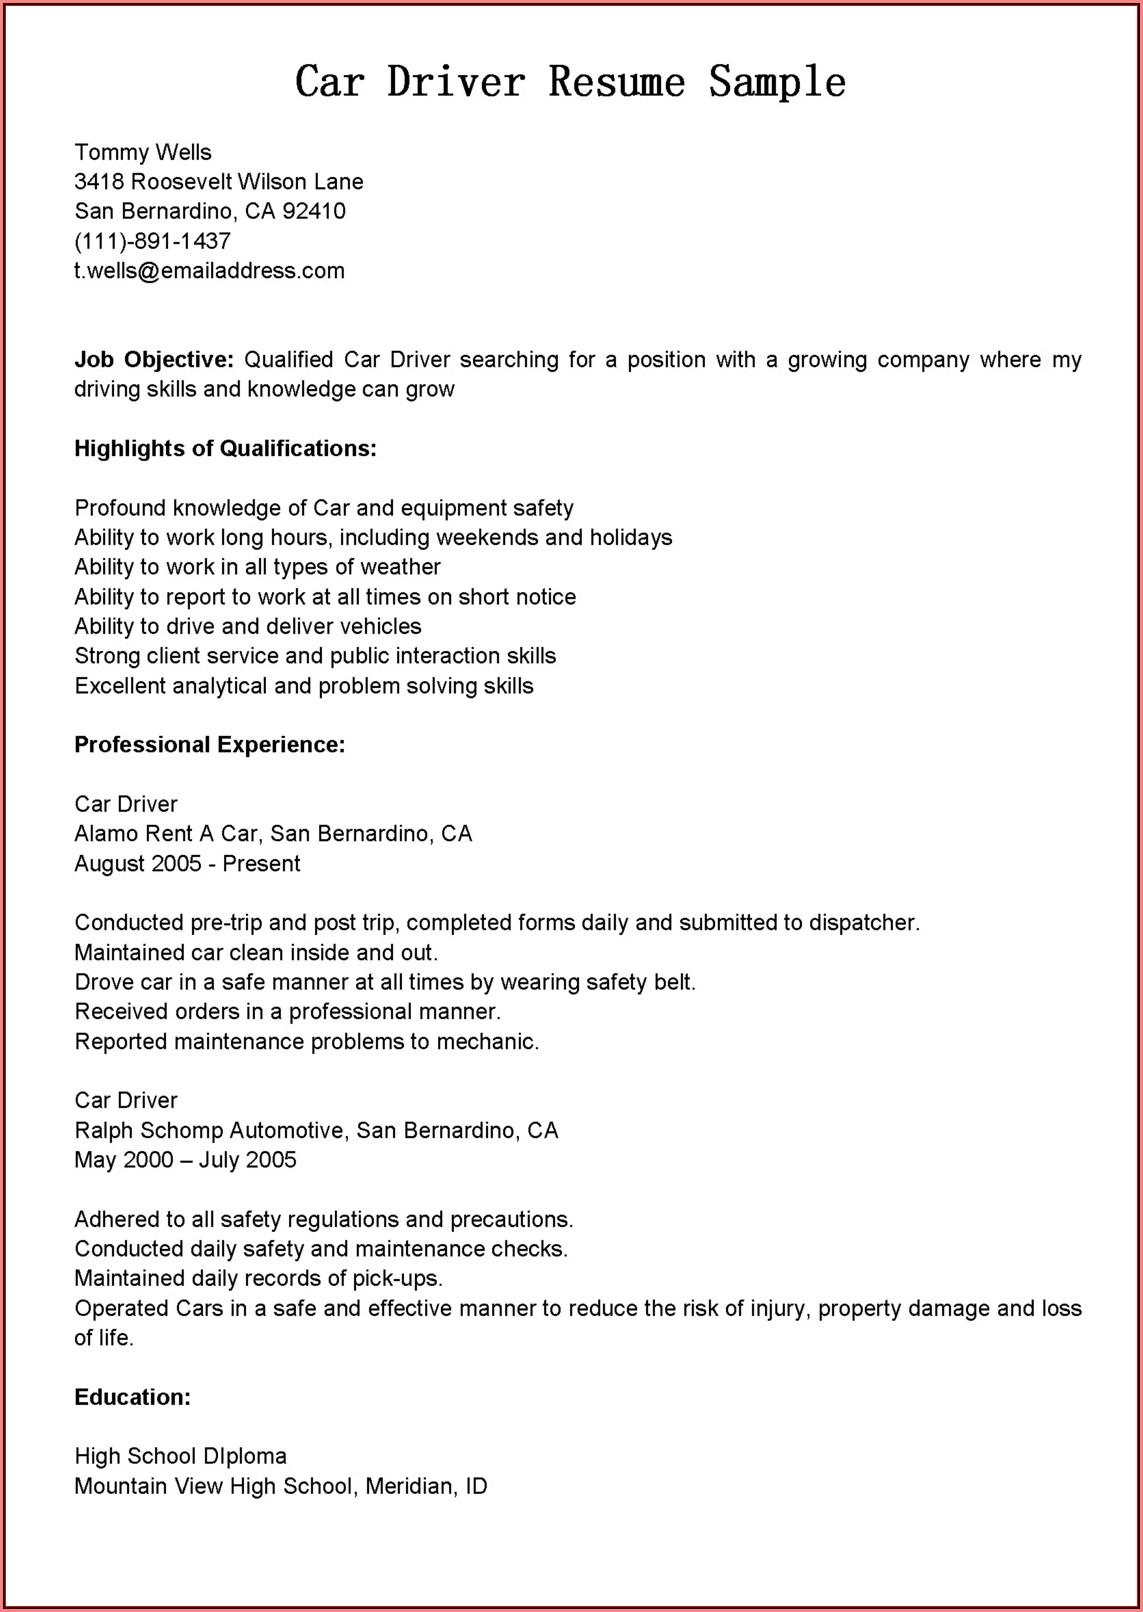 Company Car Driver Resume